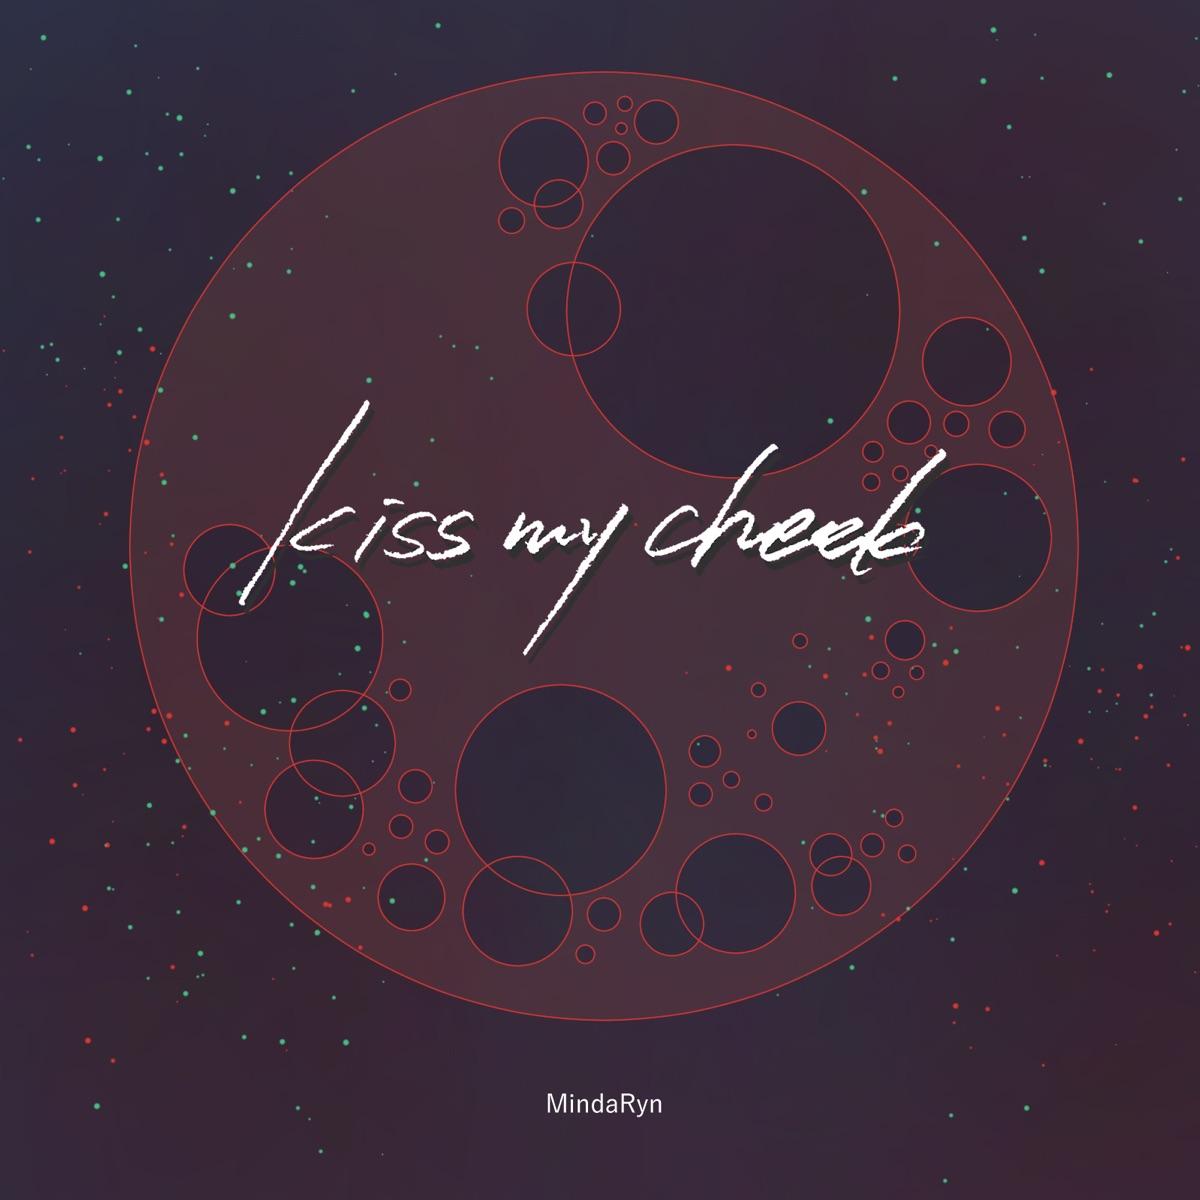 『MindaRyn - kiss my cheek』収録の『kiss my cheek』ジャケット